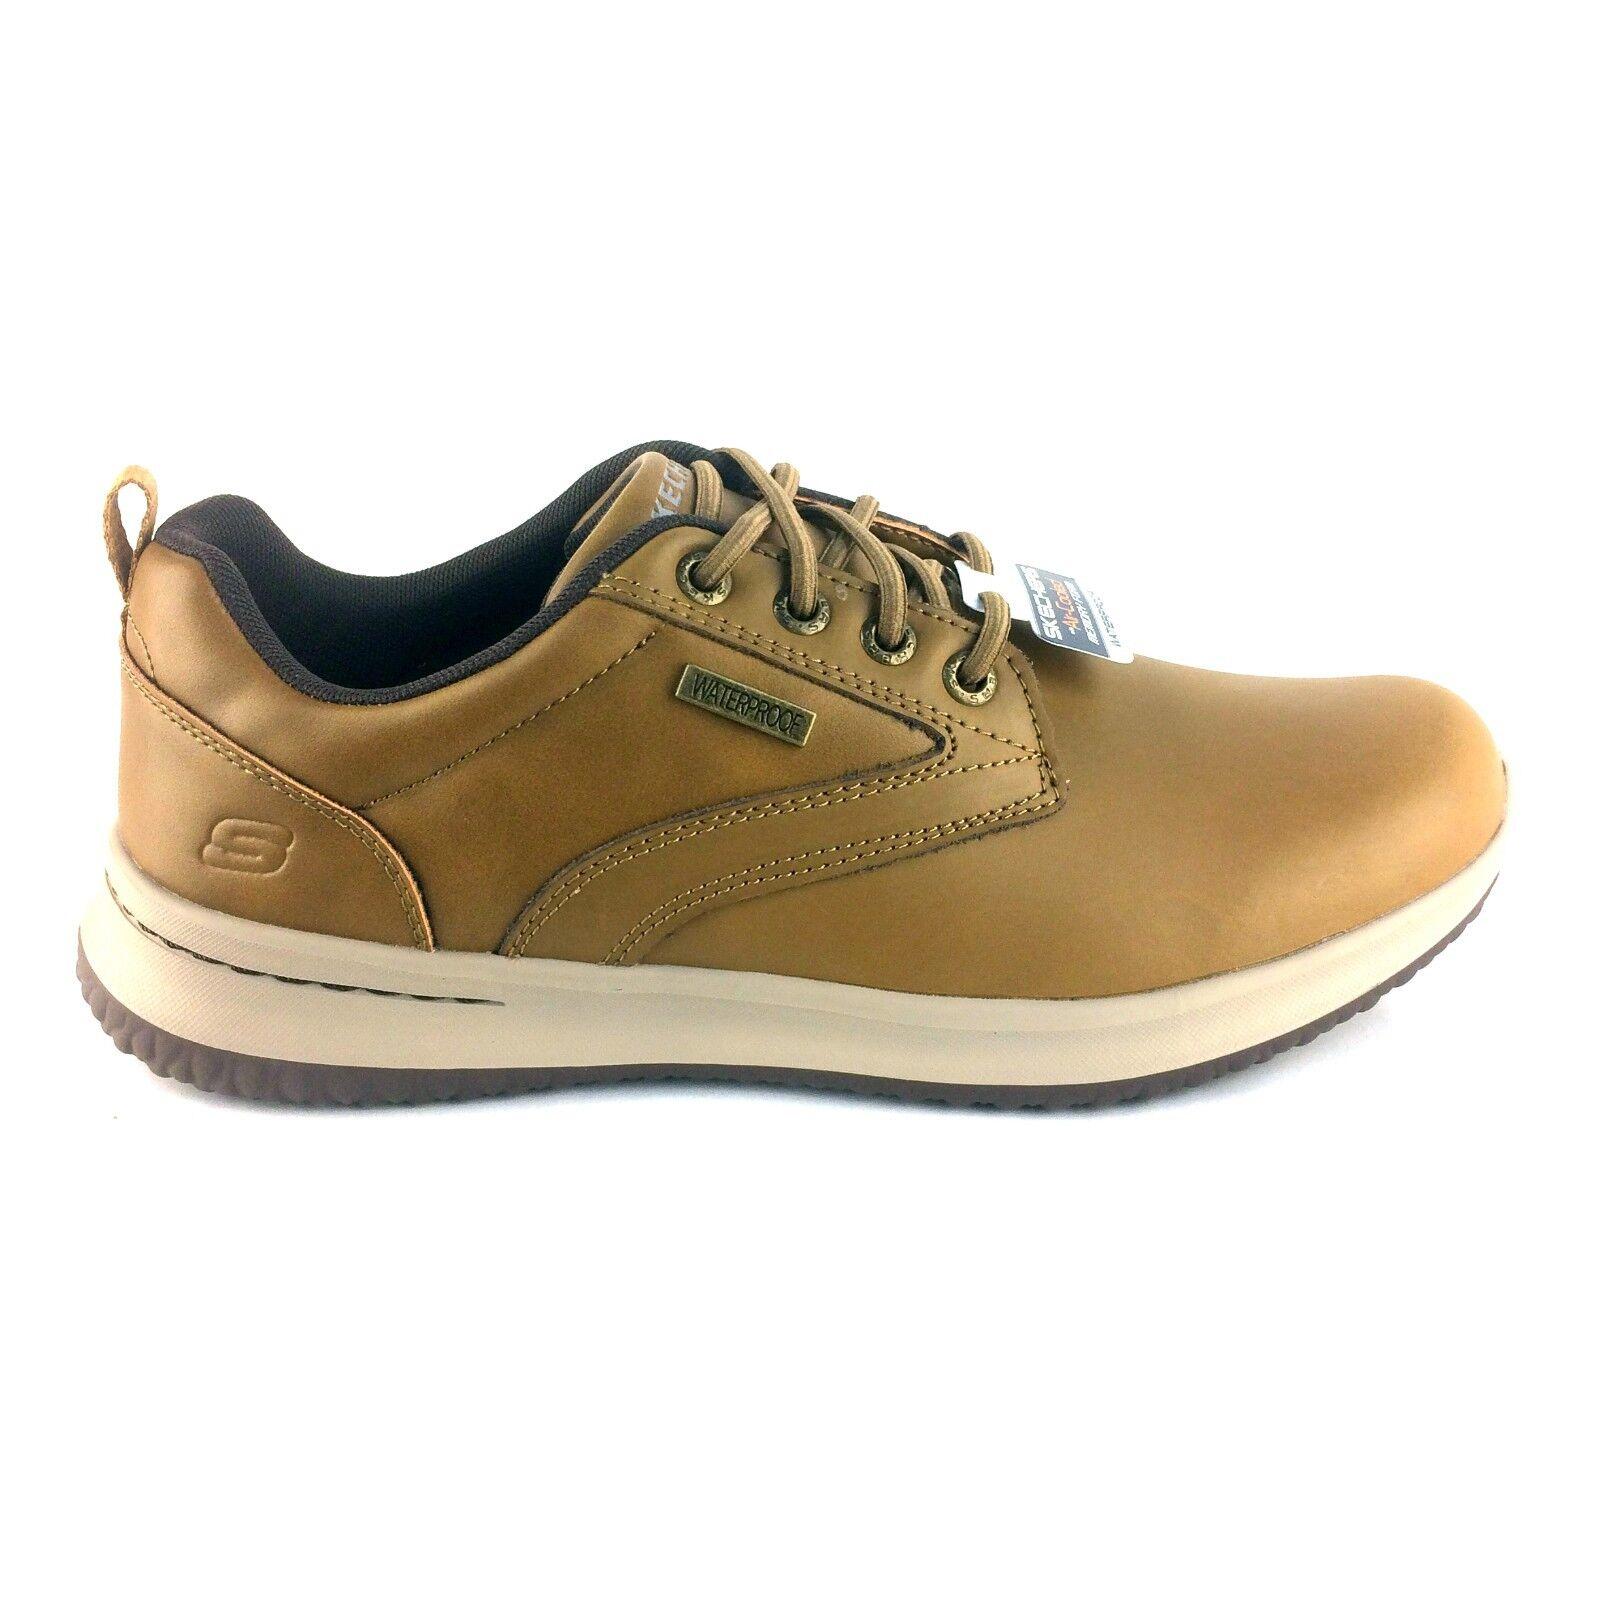 65693/TAN Skechers, Antigo Uomo Delson Antigo Oxfords Antigo Skechers, Sneaker f27b05